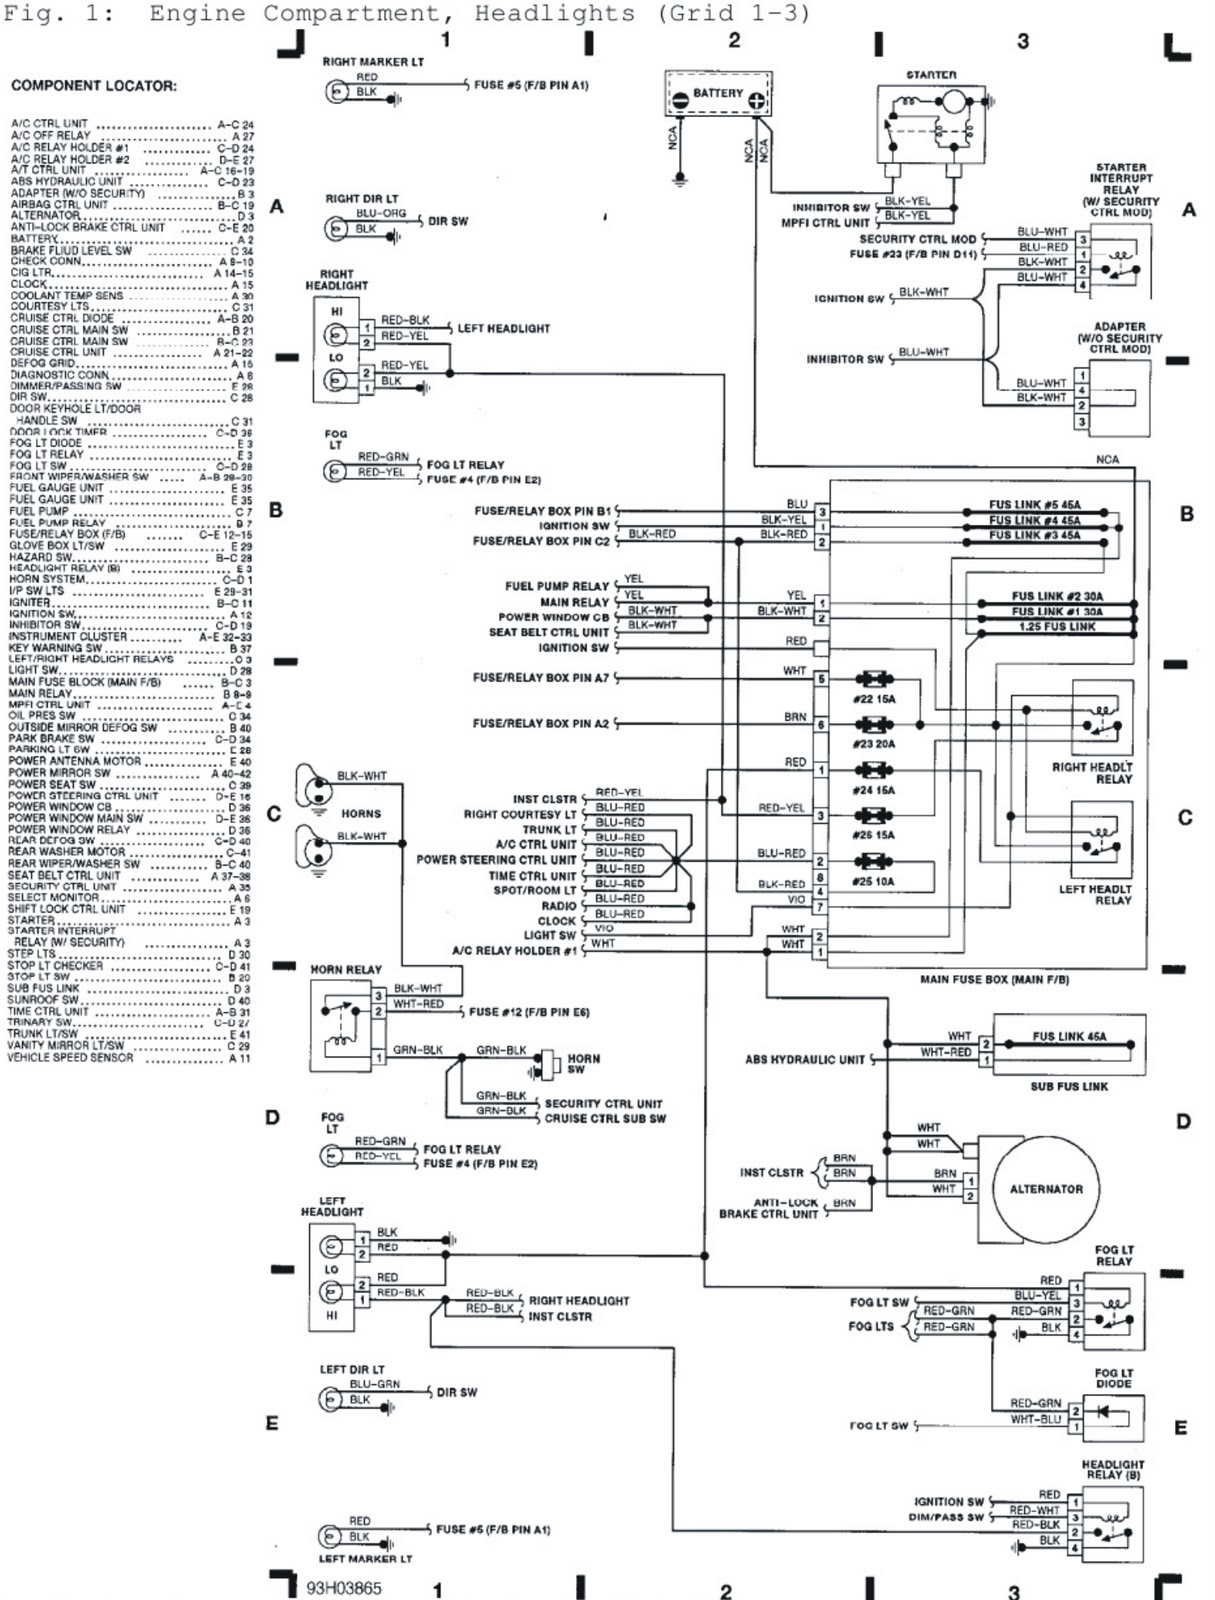 1992 Subaru SVX Engine Compartment, Headlights, System Wiring Diagrams | Schematic Wiring